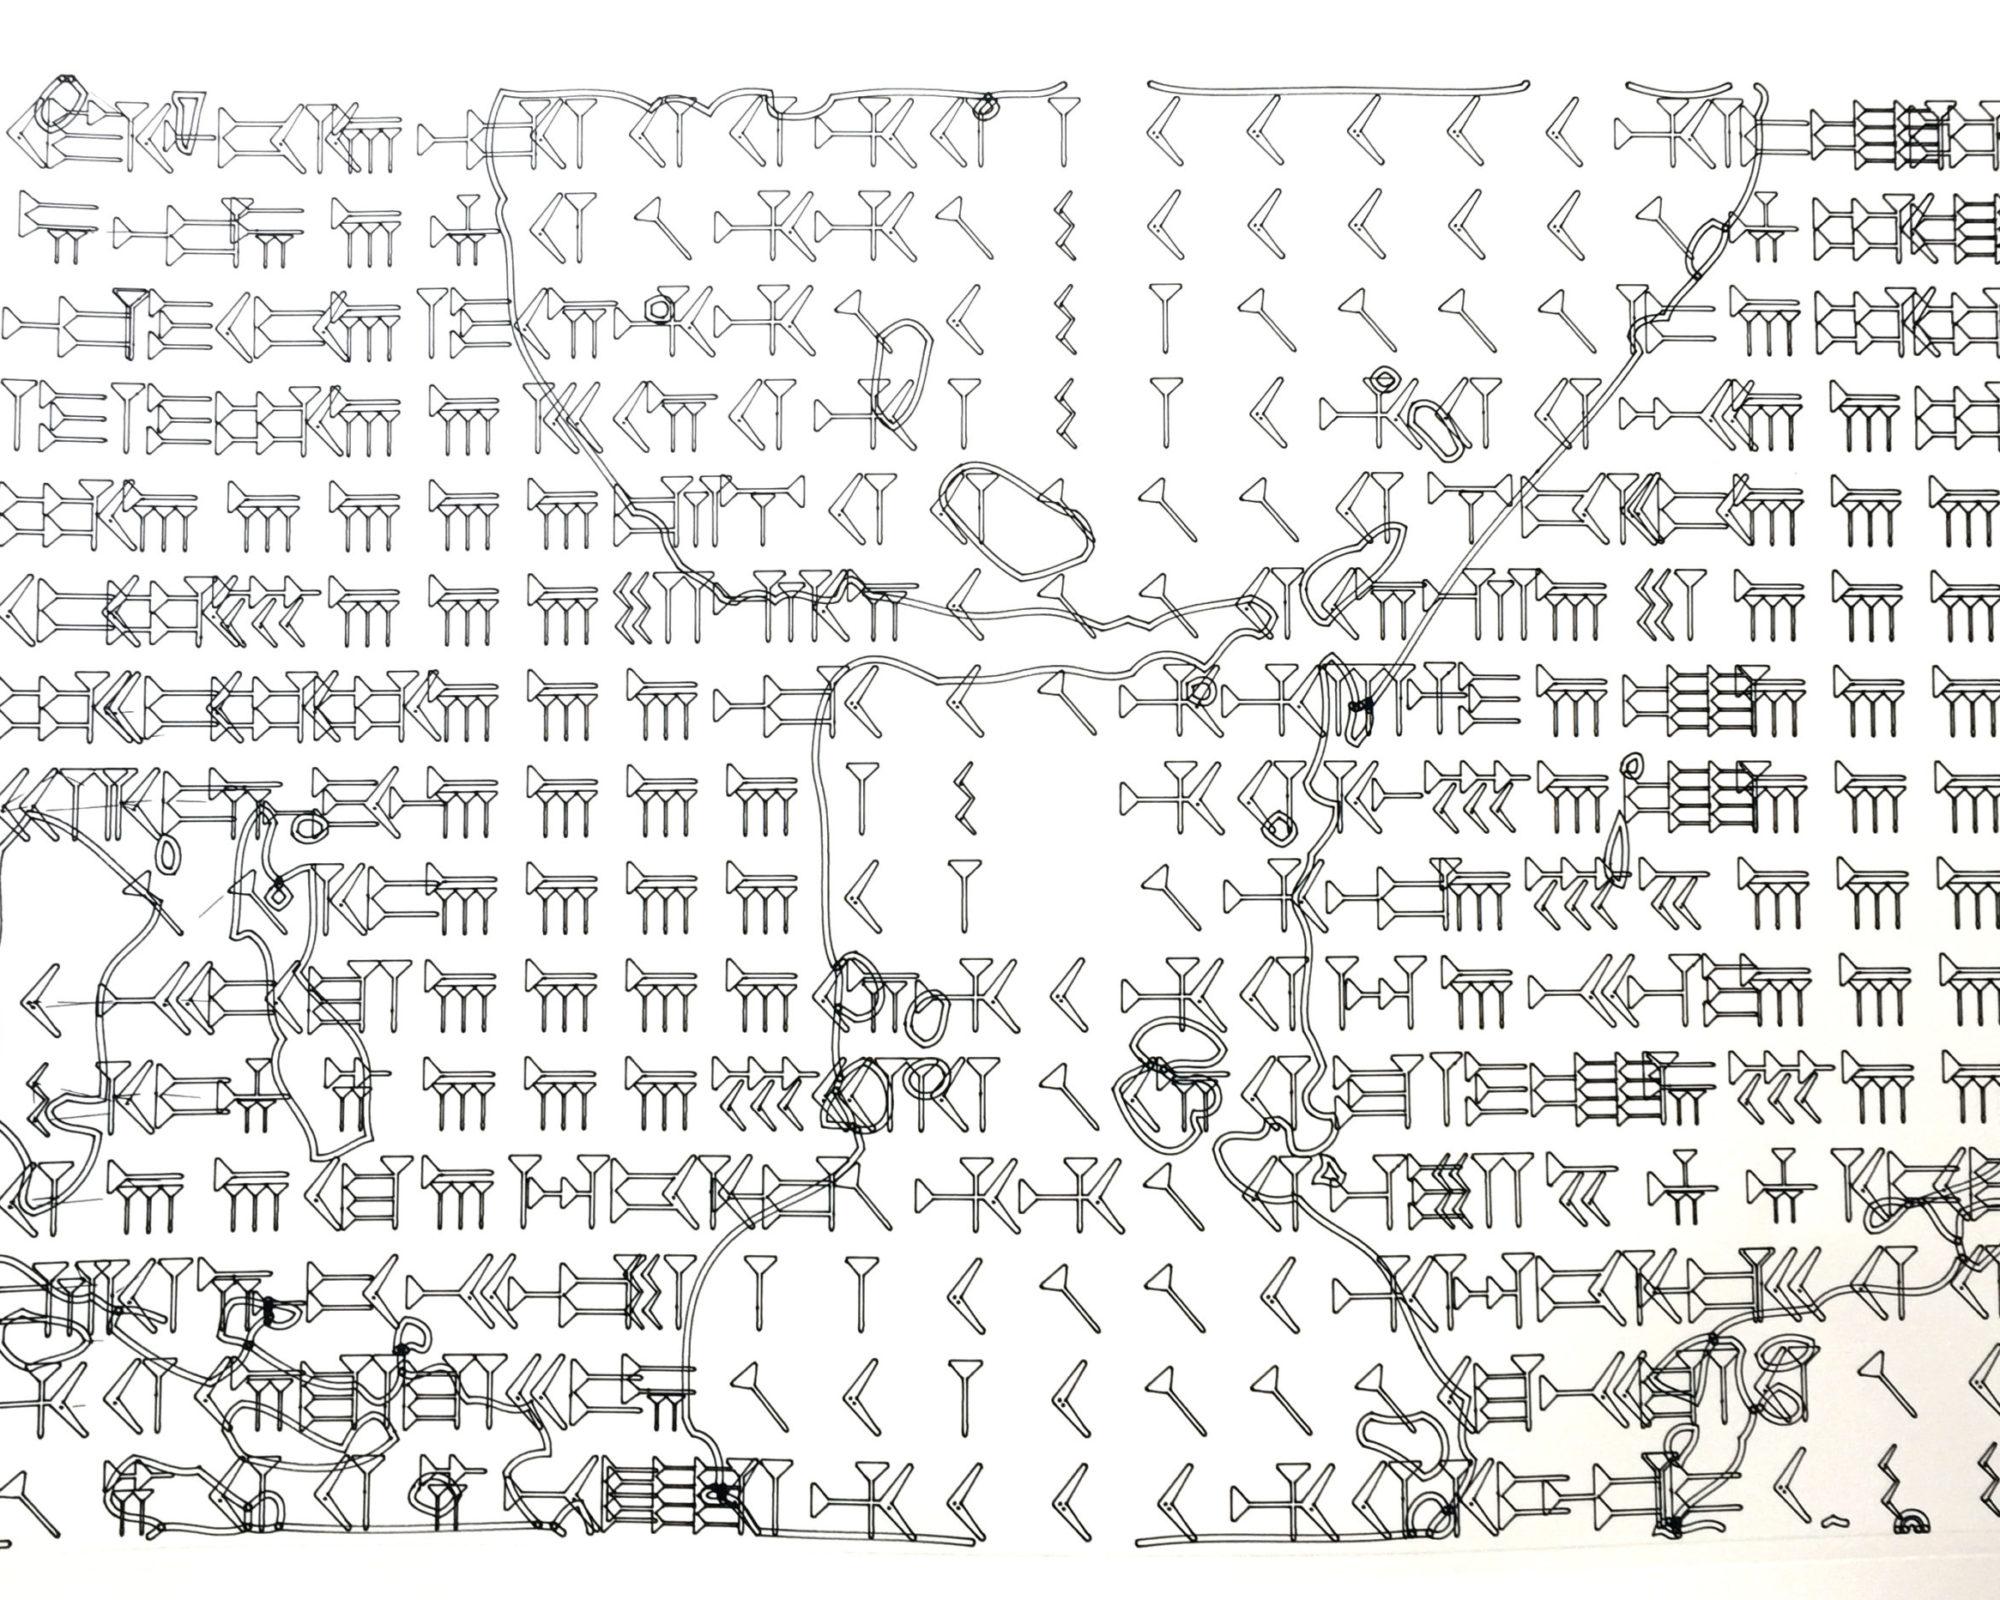 Vuk Cosic, Very Deep ASCII, plotter drawing, ink on paper, 42 x 60 cm, 2015